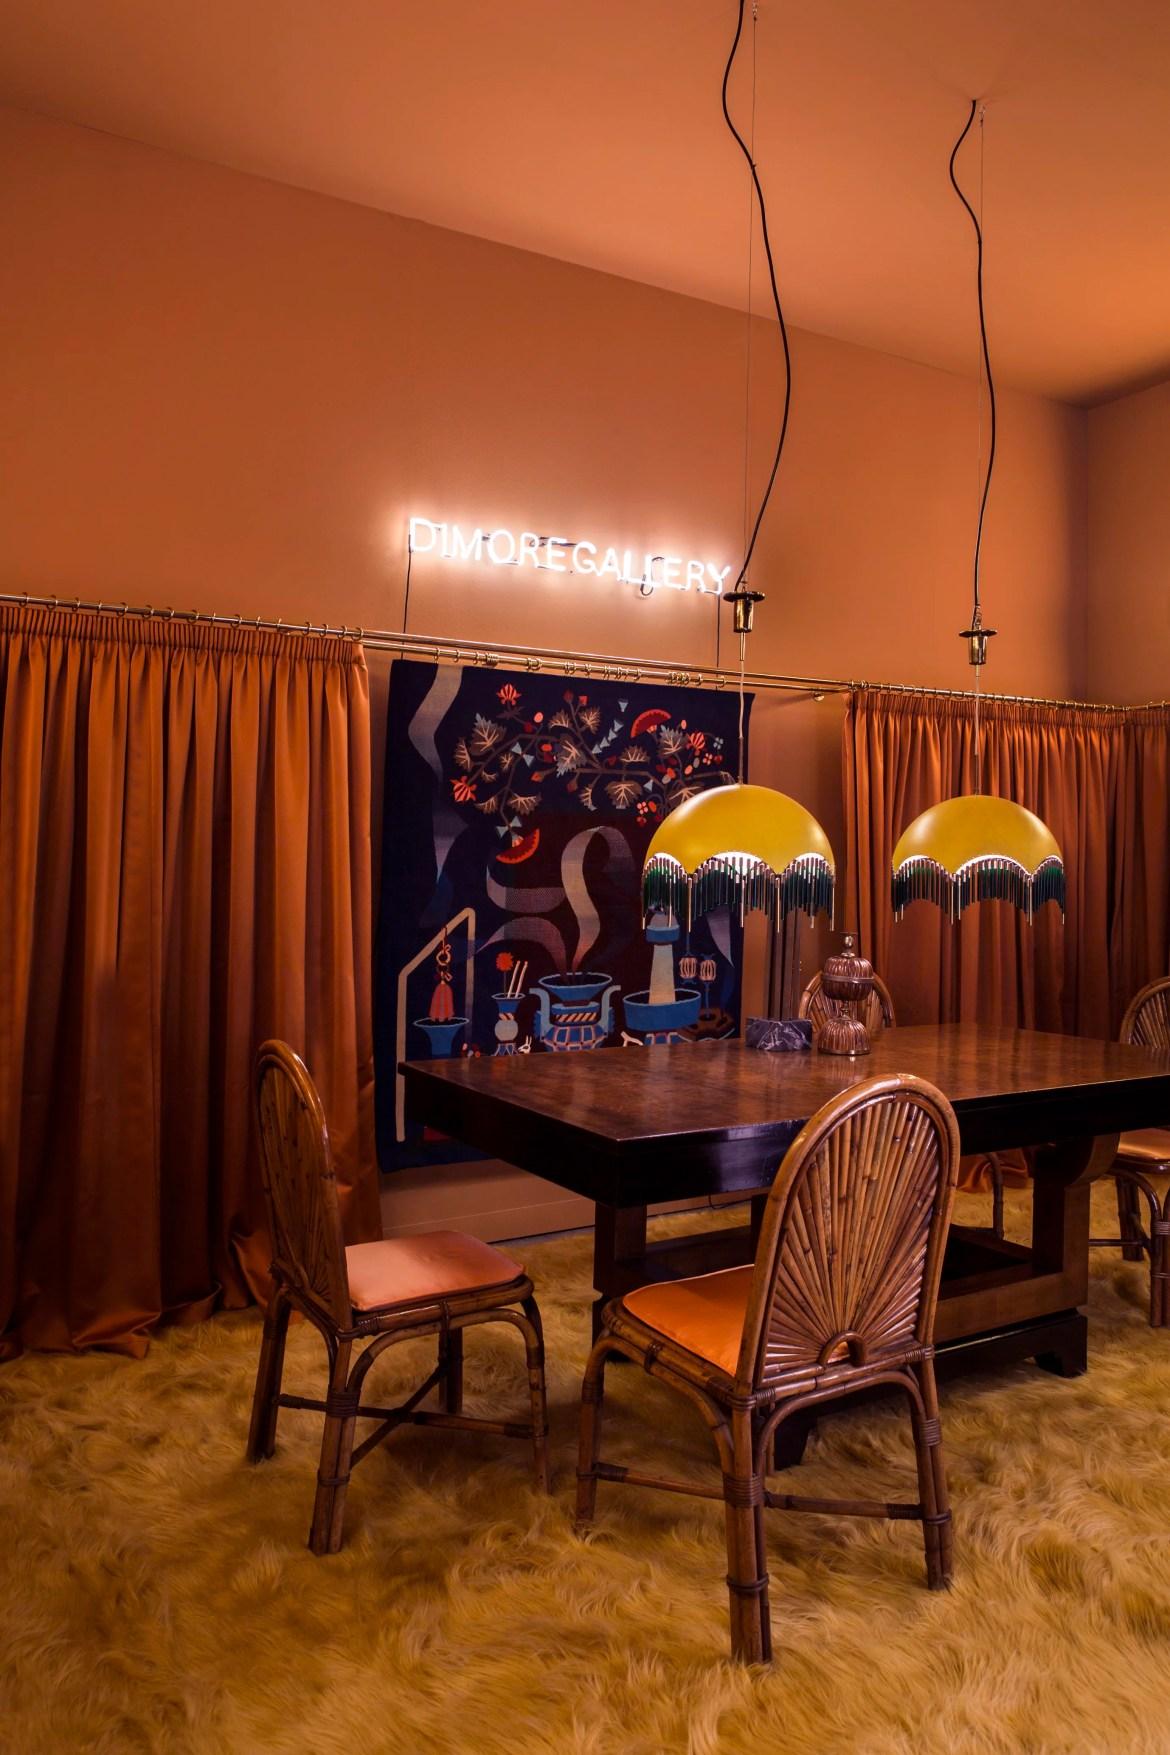 DesignMiami: Basel-2019-Dimoregallery-presents-tribute-to-Piero-Portaluppi-huskdesignblog1